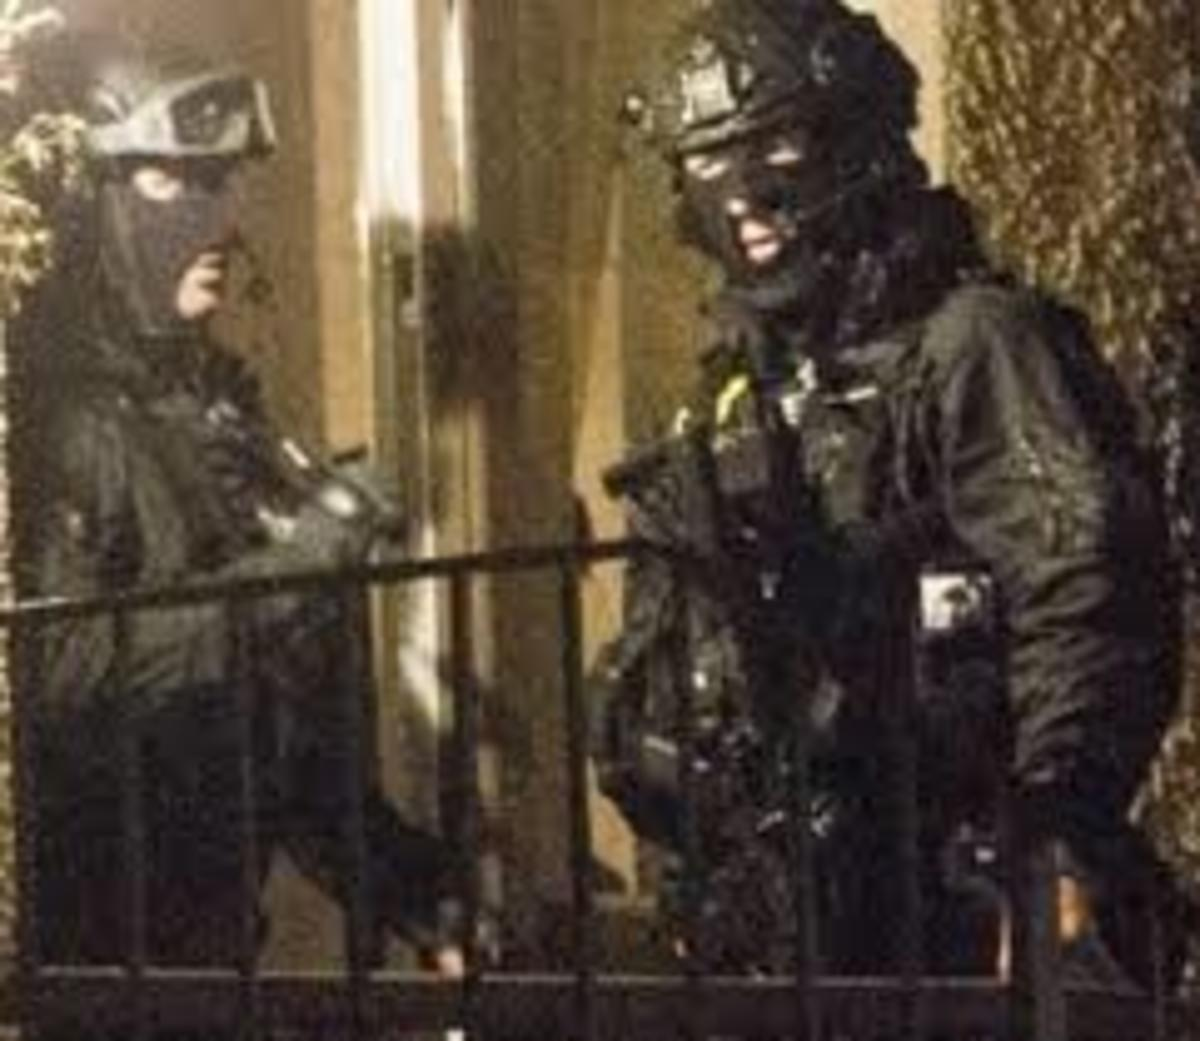 MI5-tasked storm troopersharassing IRSP community activists.